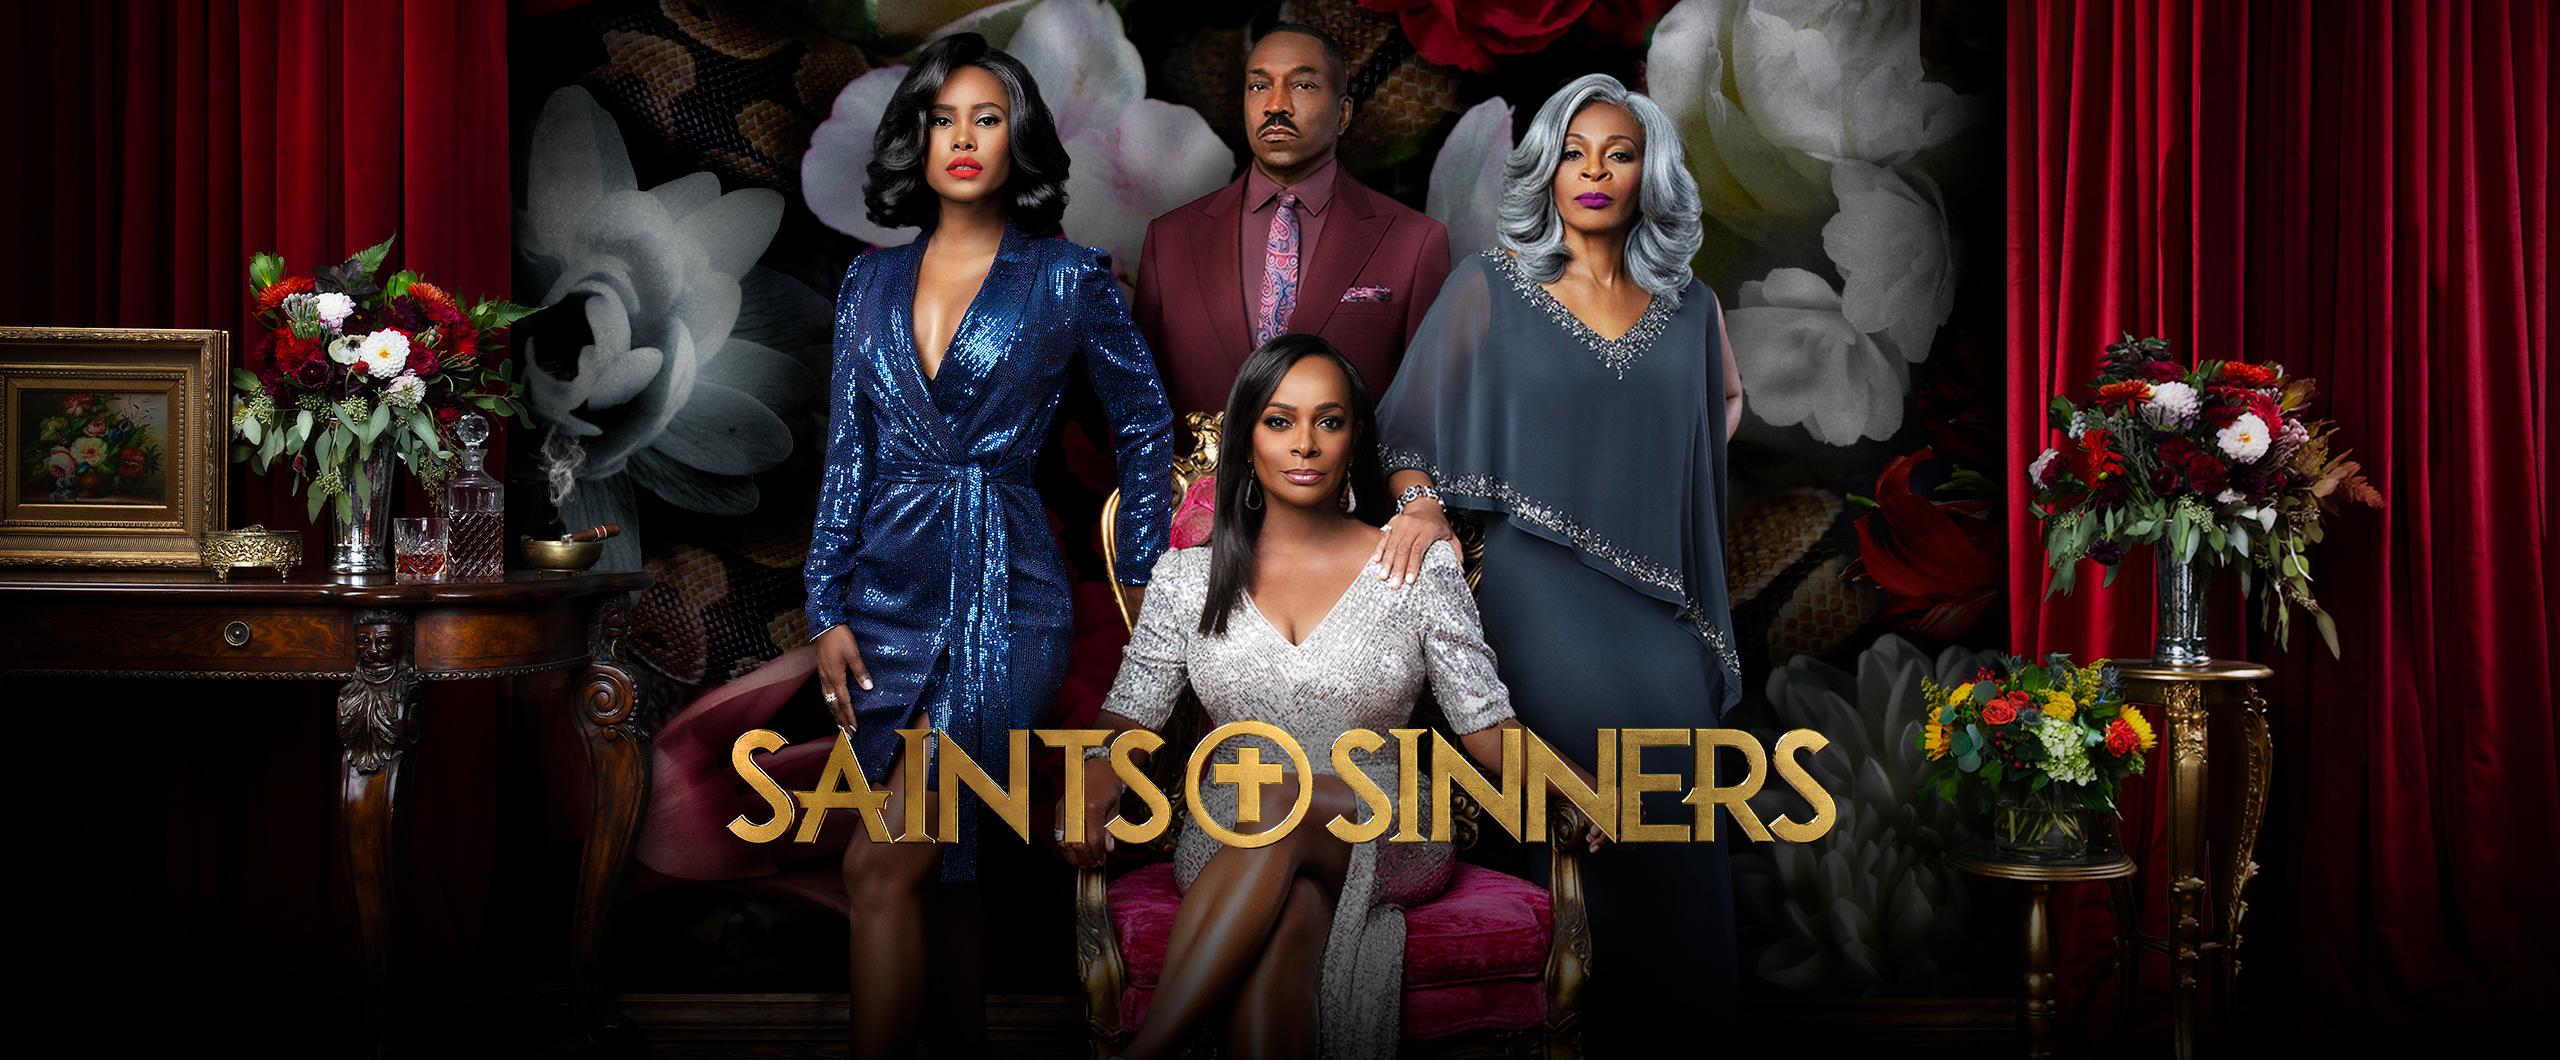 Saints and Sinners Season 5